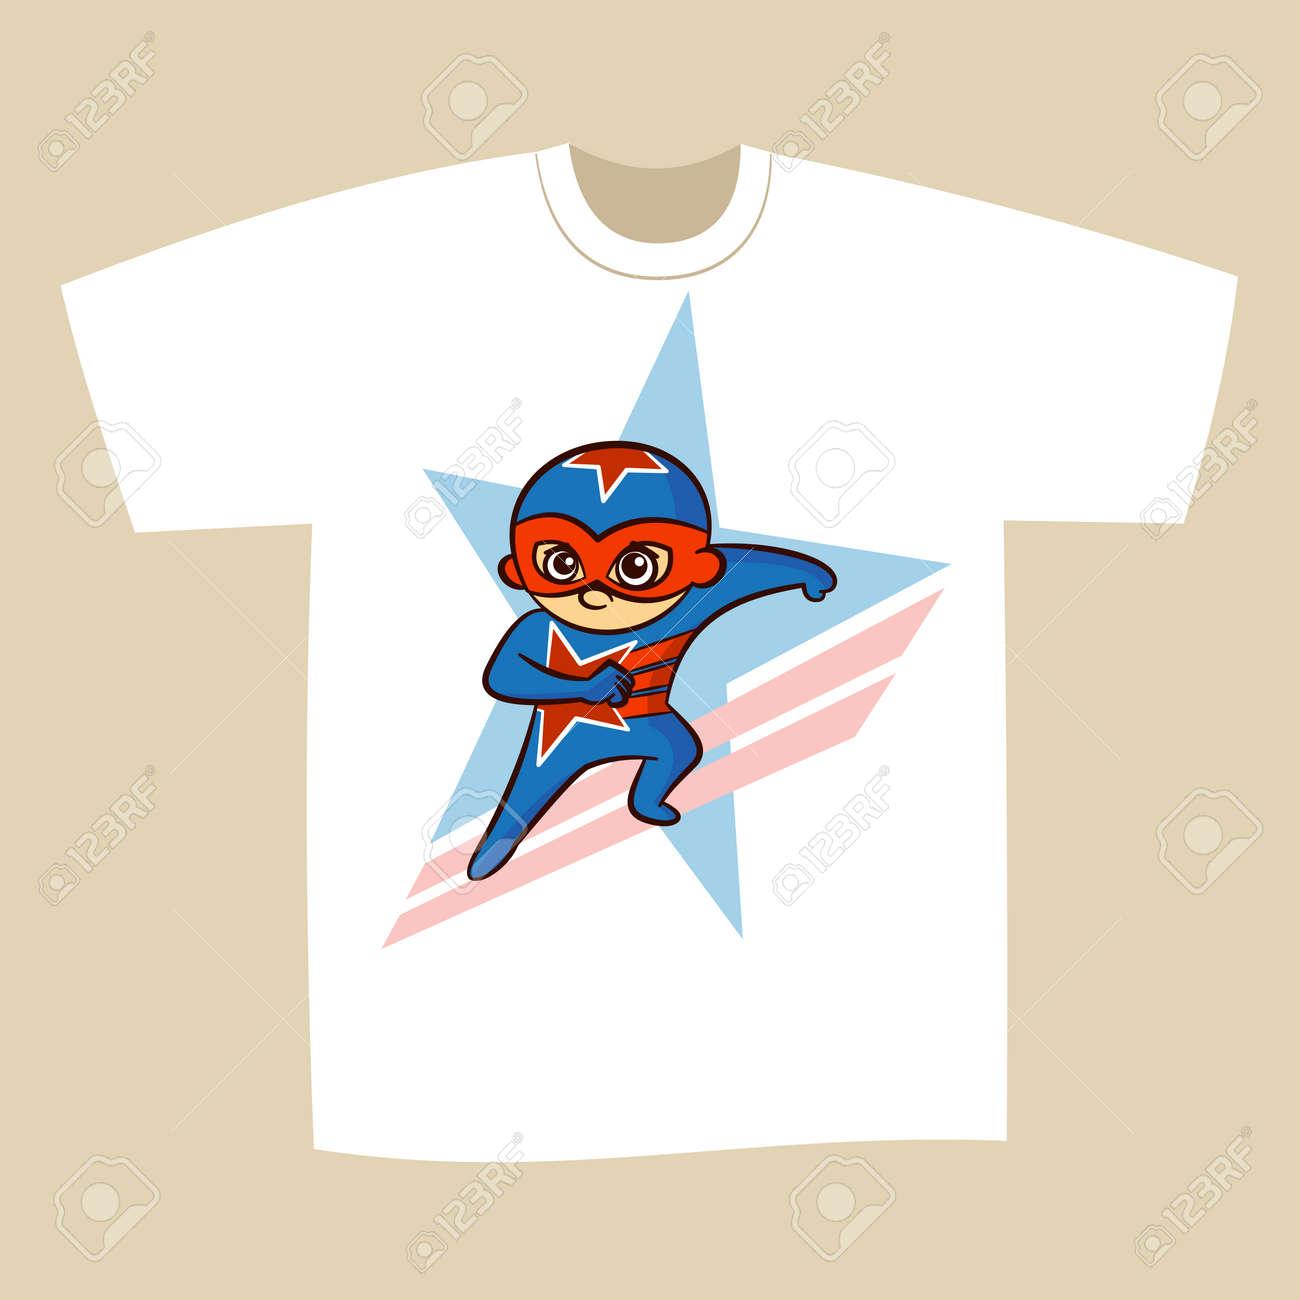 0644997d T-shirt Print Design Cartoon Superhero Vector Illustration Stock Vector -  78757639